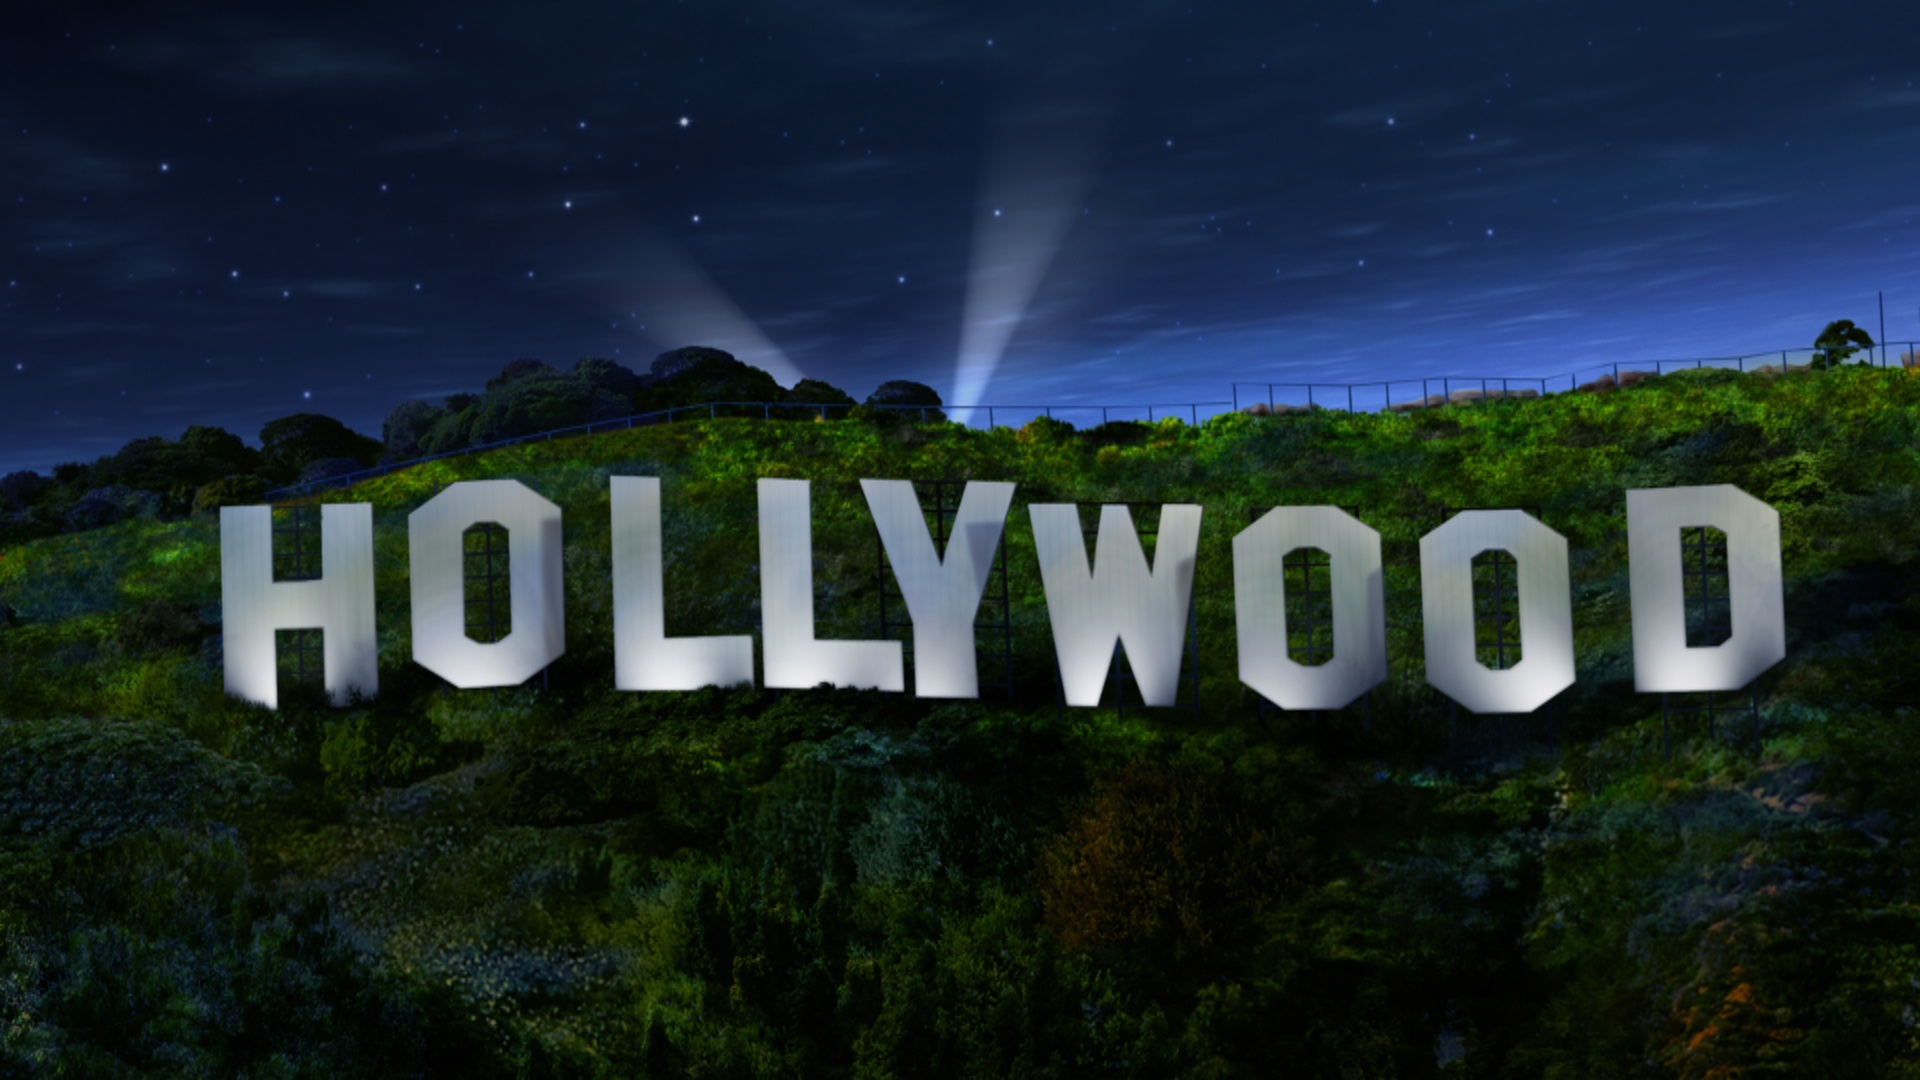 Analis: Hollywood Terkenal dengan Budaya Tidak Bermoral